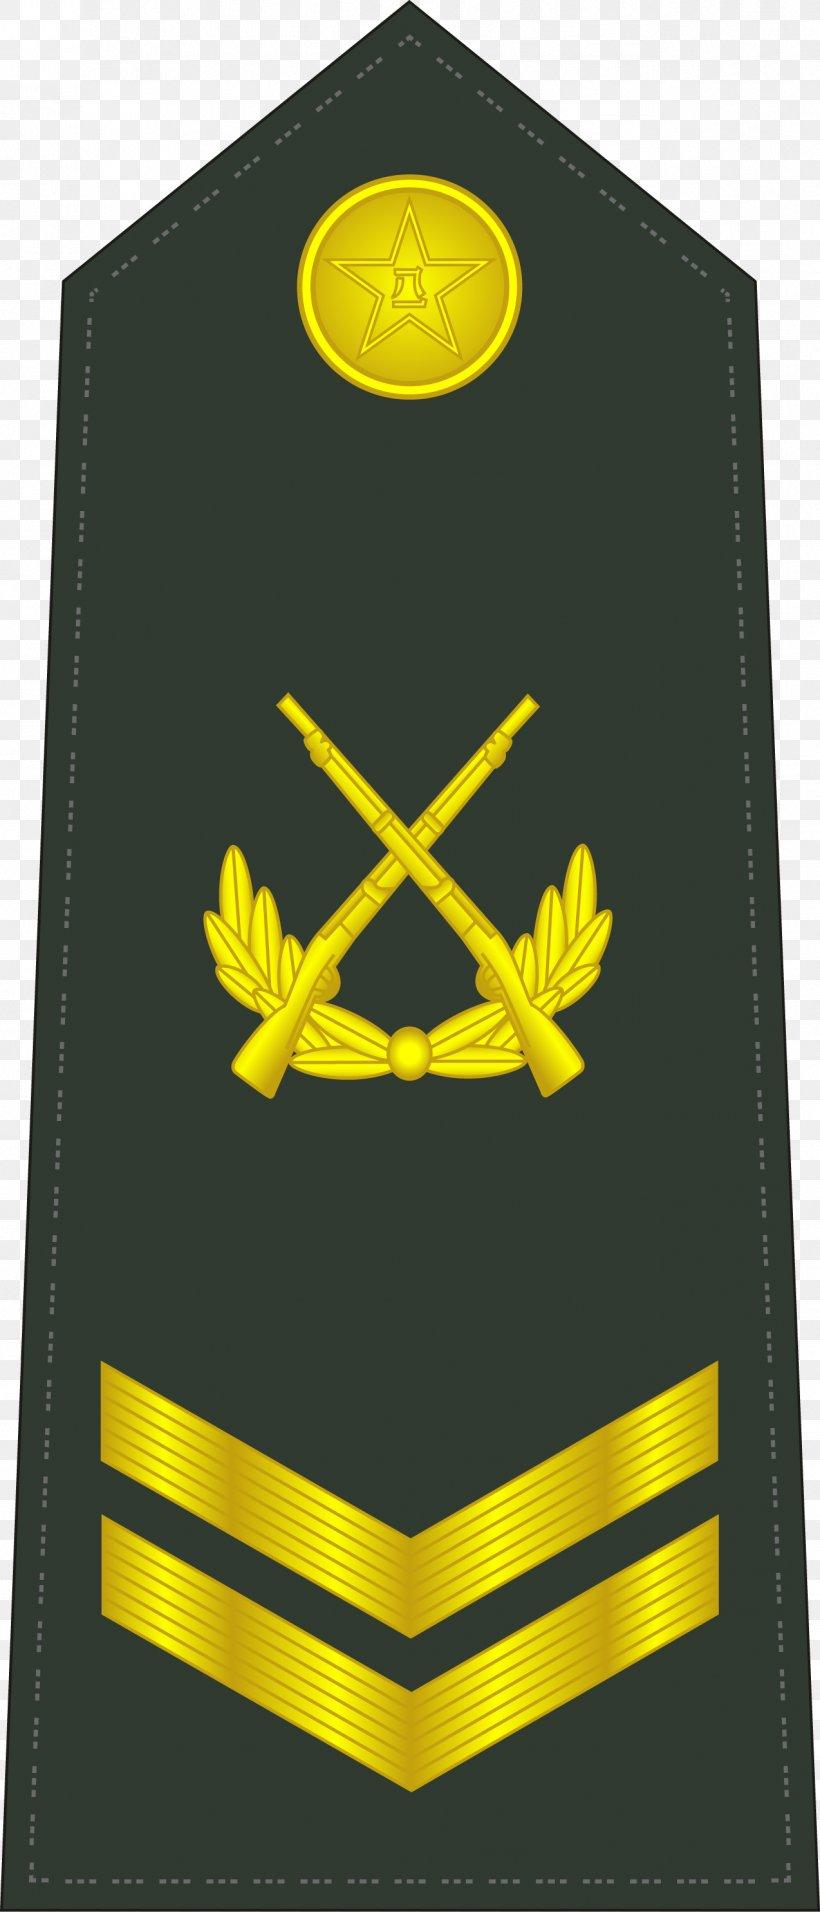 Master Sergeant Military Rank Shoulder Mark Sergeant Major, PNG, 1274x2971px, Sergeant, Brand, Chief Master Sergeant, Corporal, Emblem Download Free